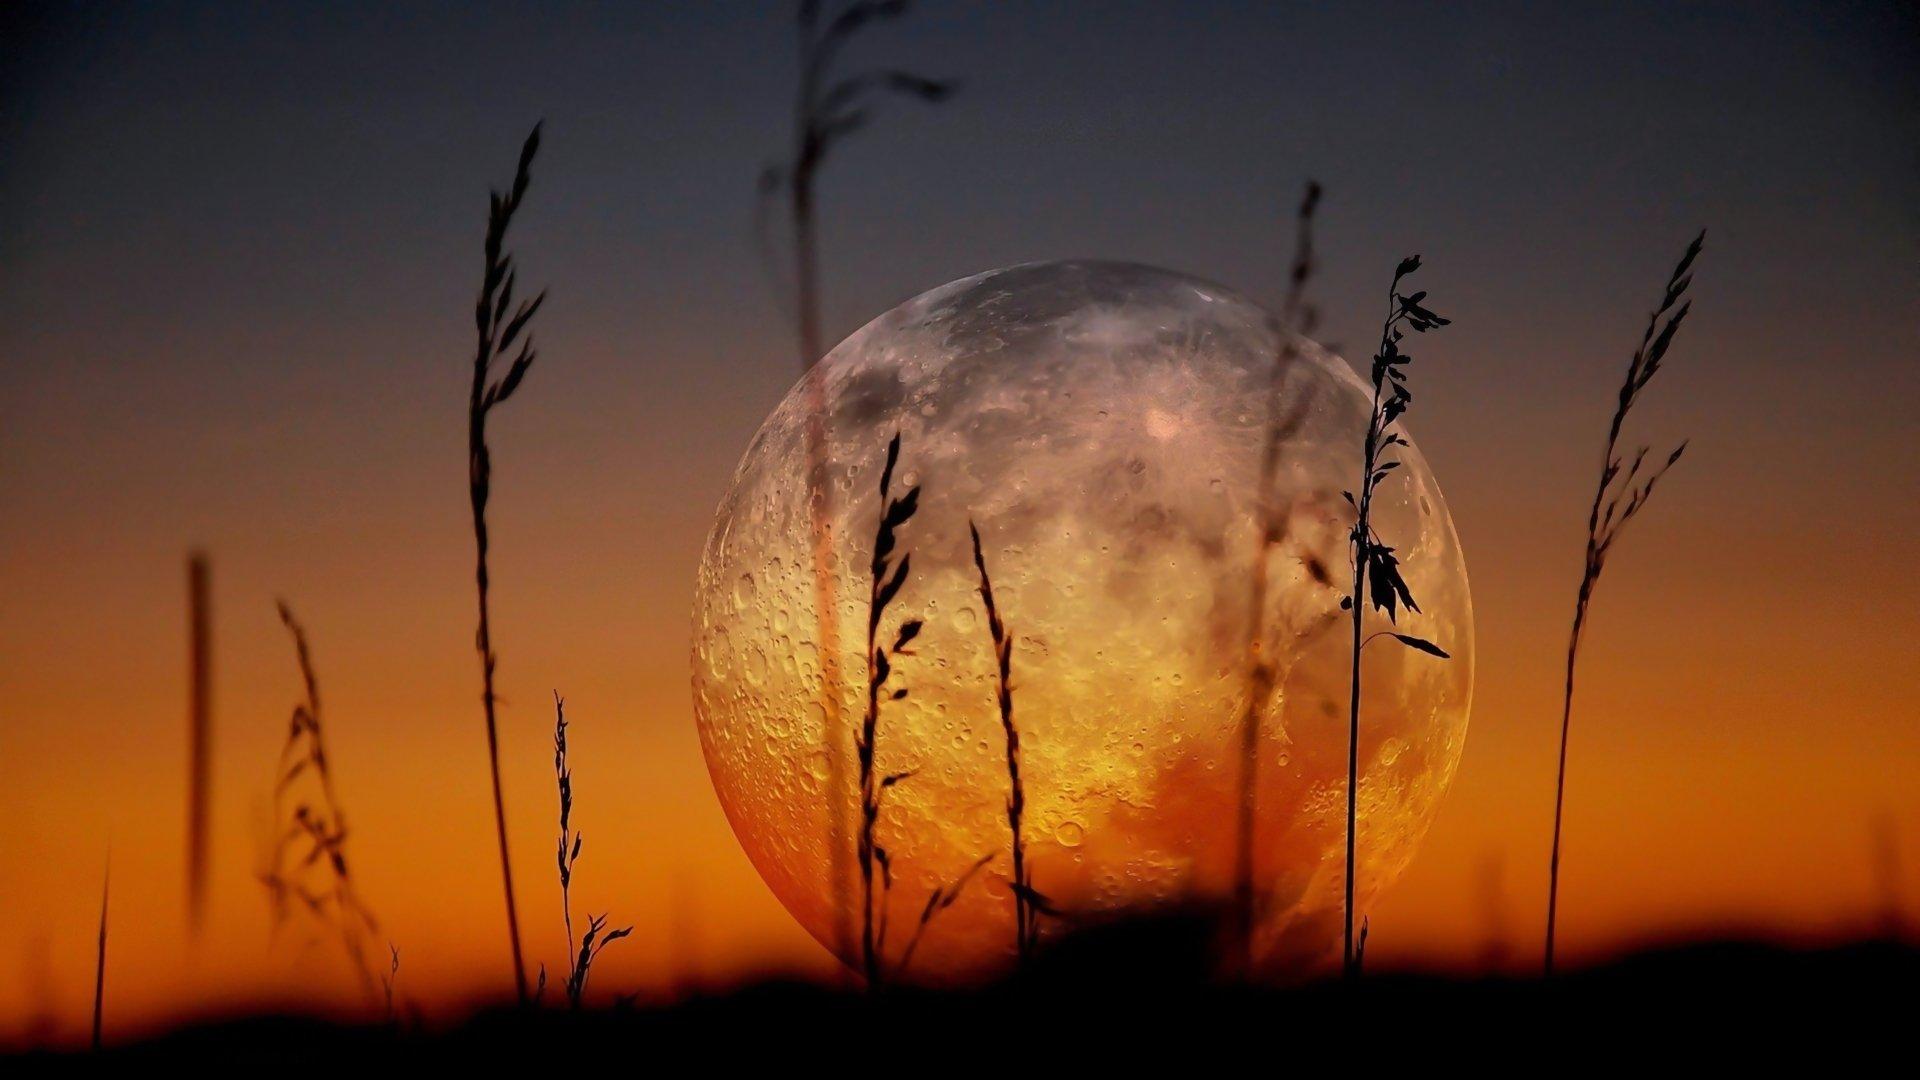 Earth - Moon  Earth Nature Landscape Sunset Wallpaper